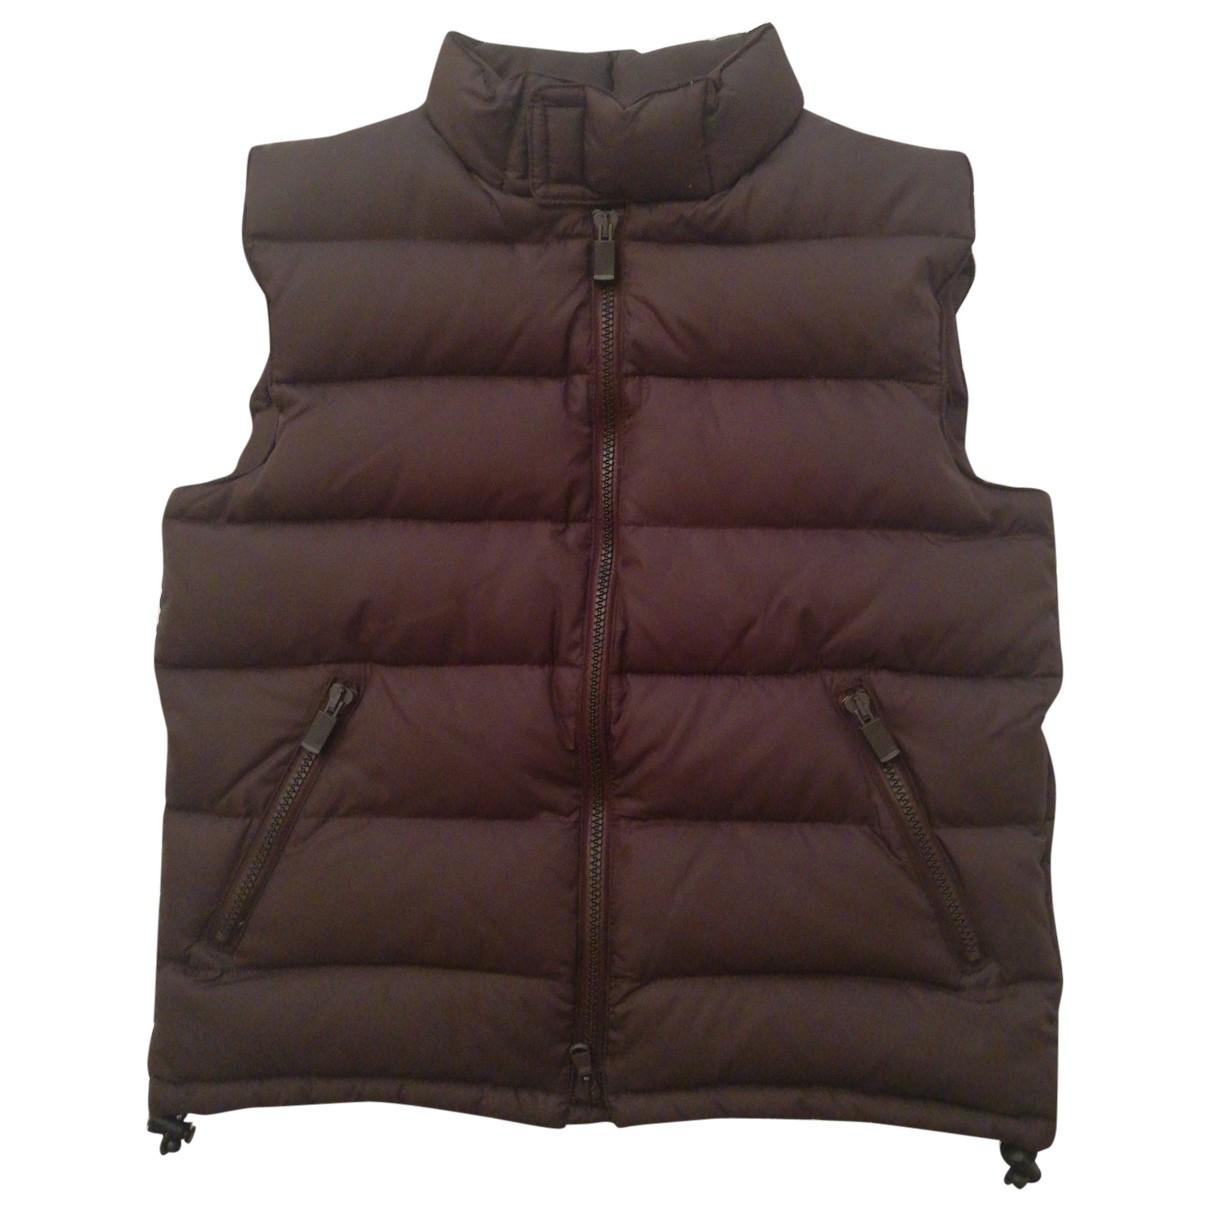 Aspesi \N Brown jacket for Women XS International